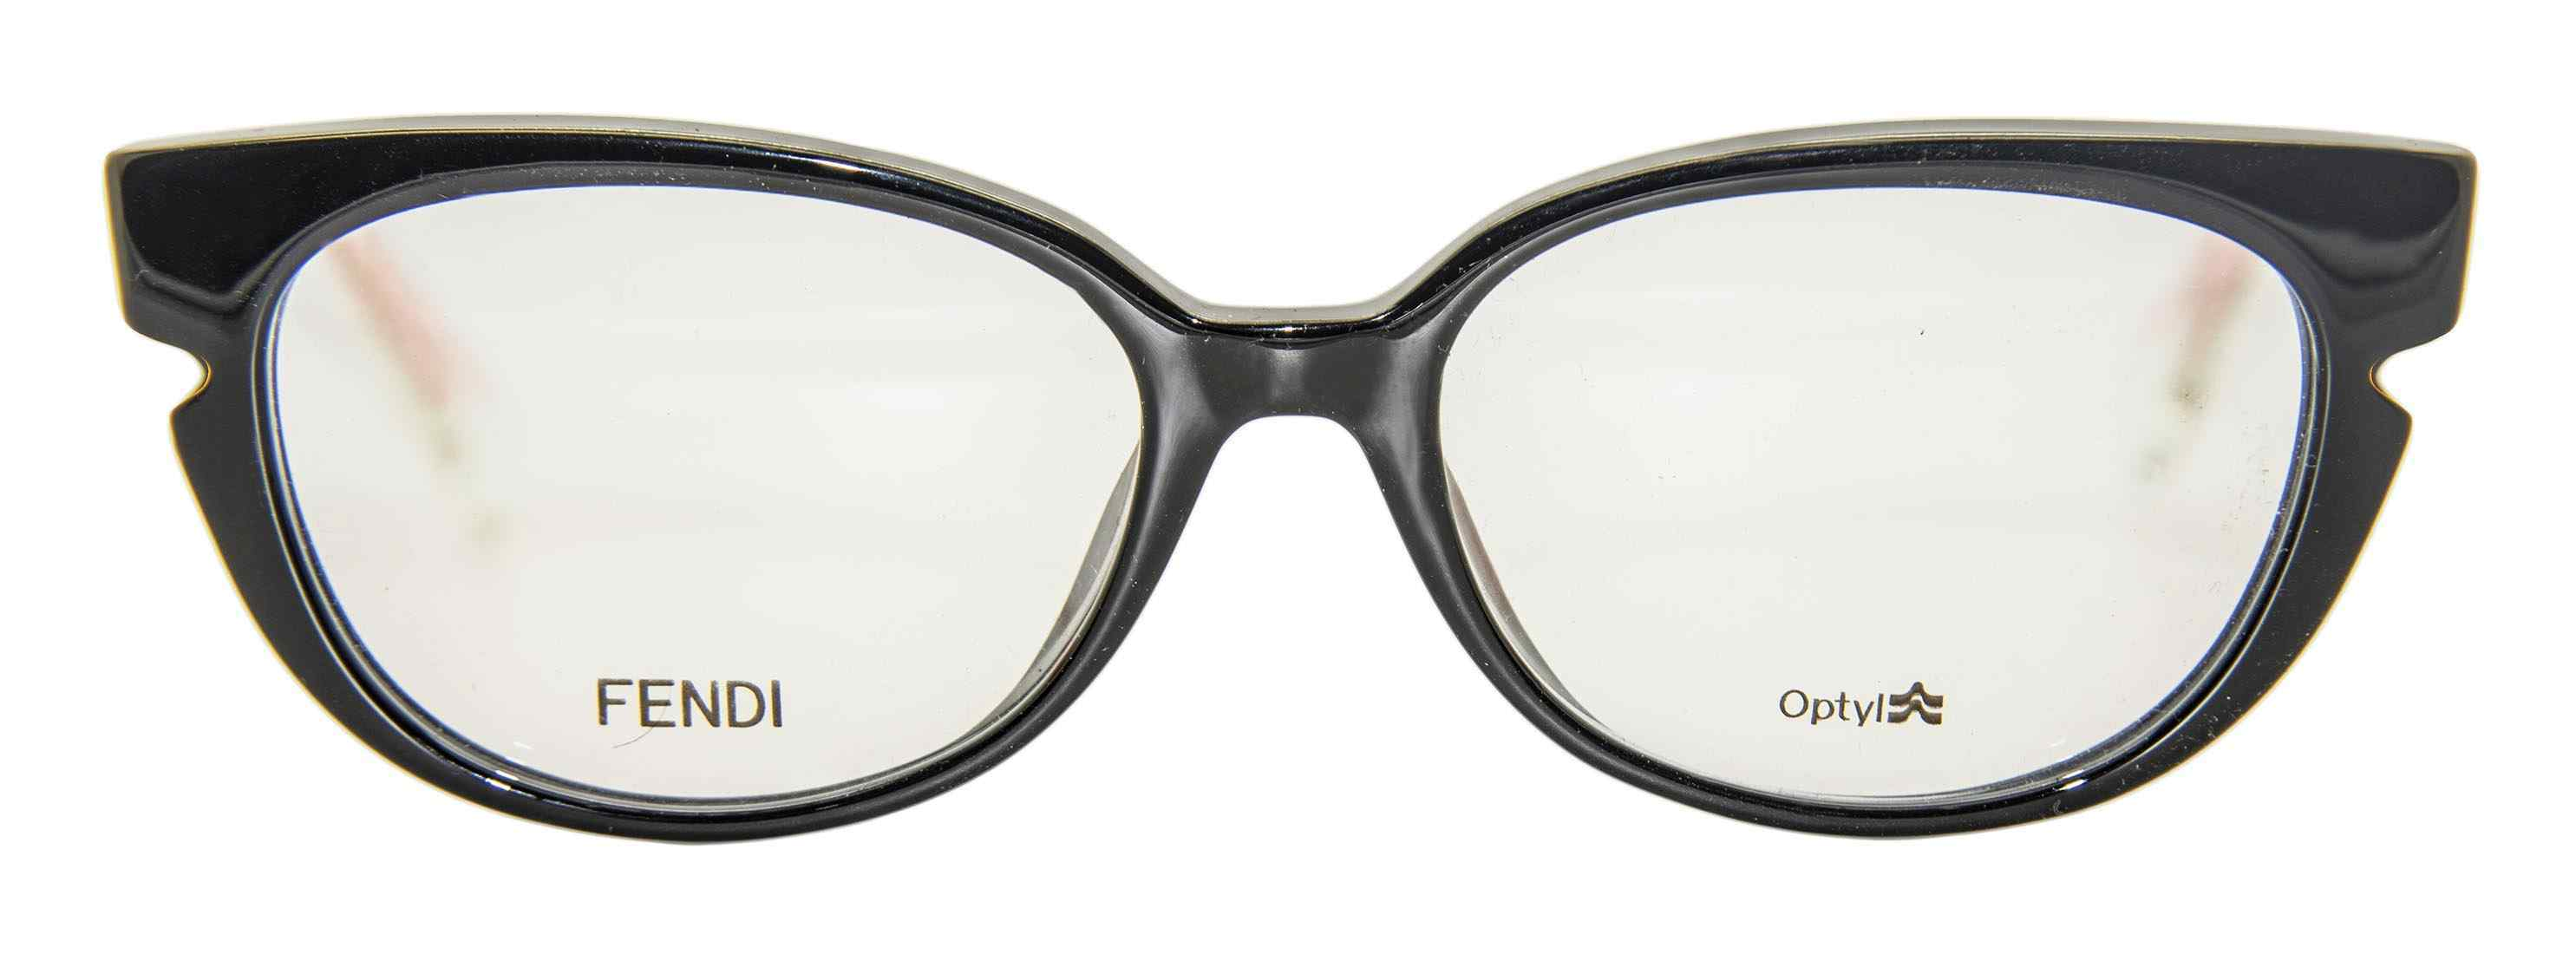 Fendi spectacles 0143 N7a 01 2970x1100